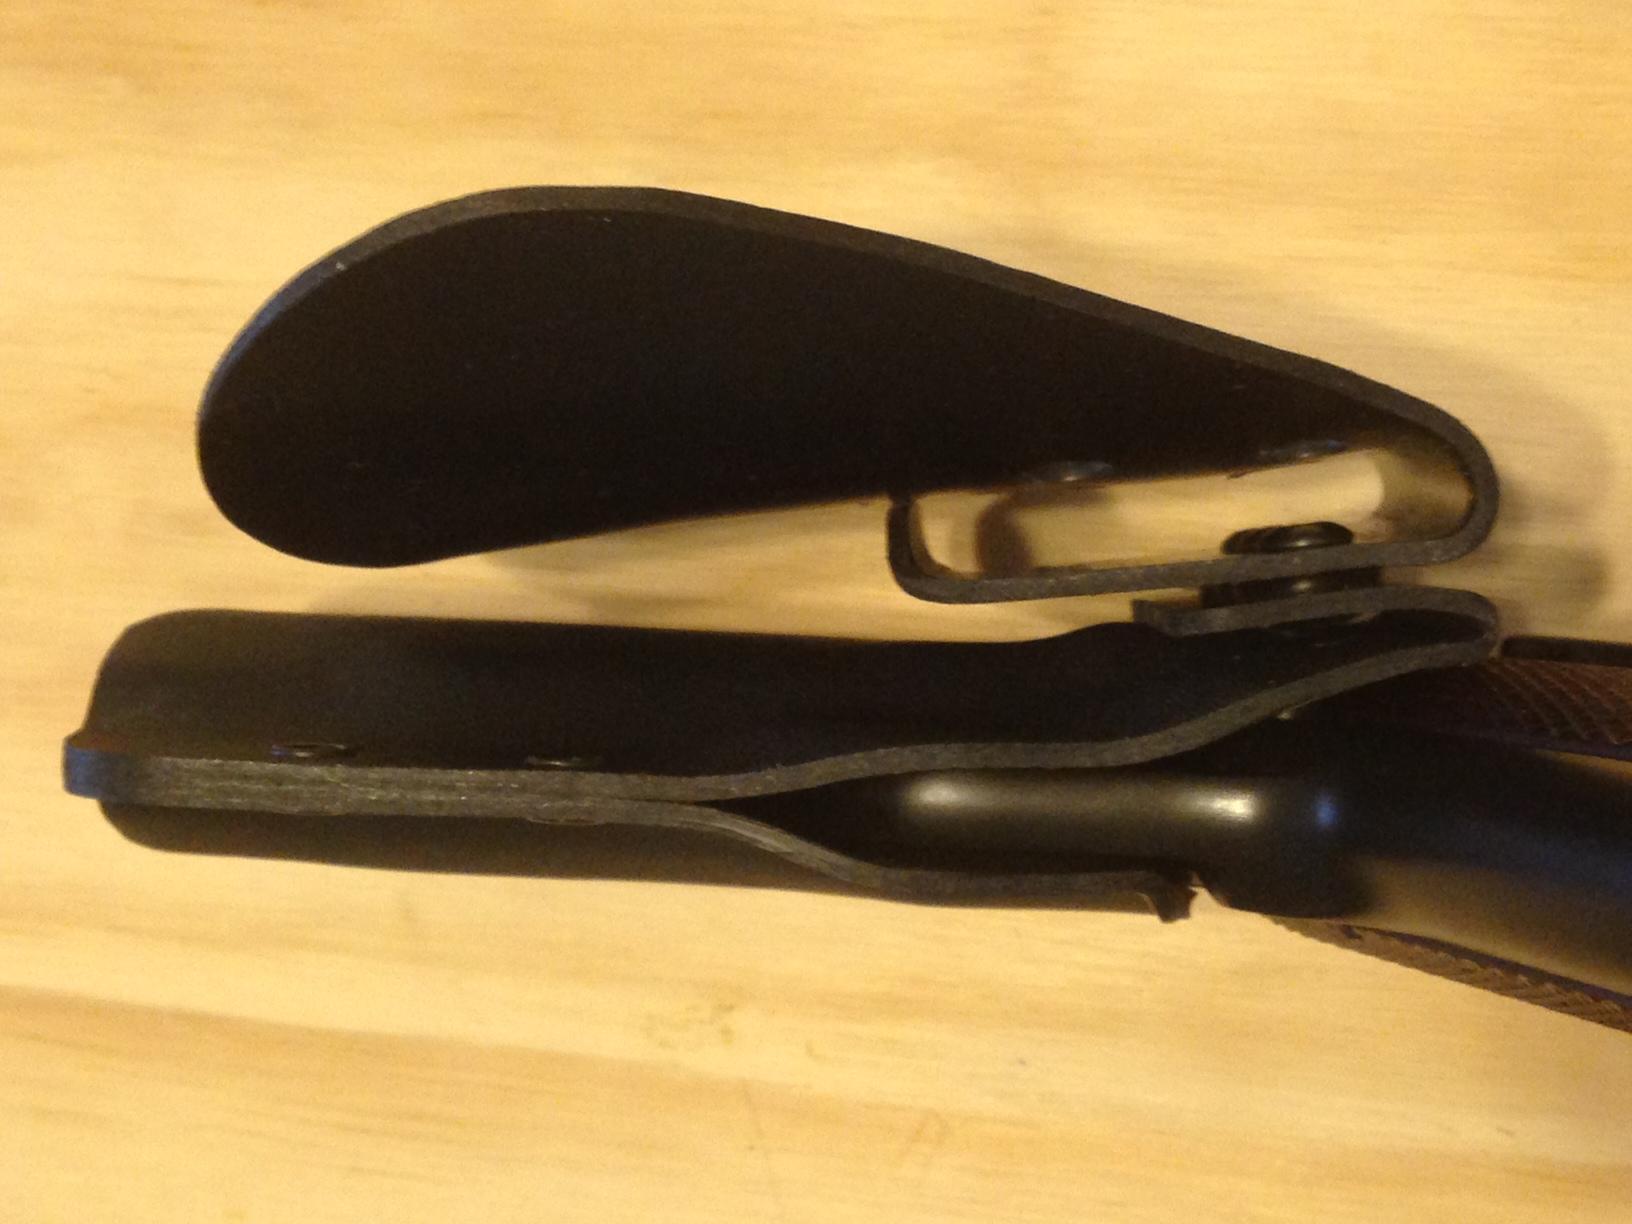 kydex paddle holster work in progress...-photo-5.jpg